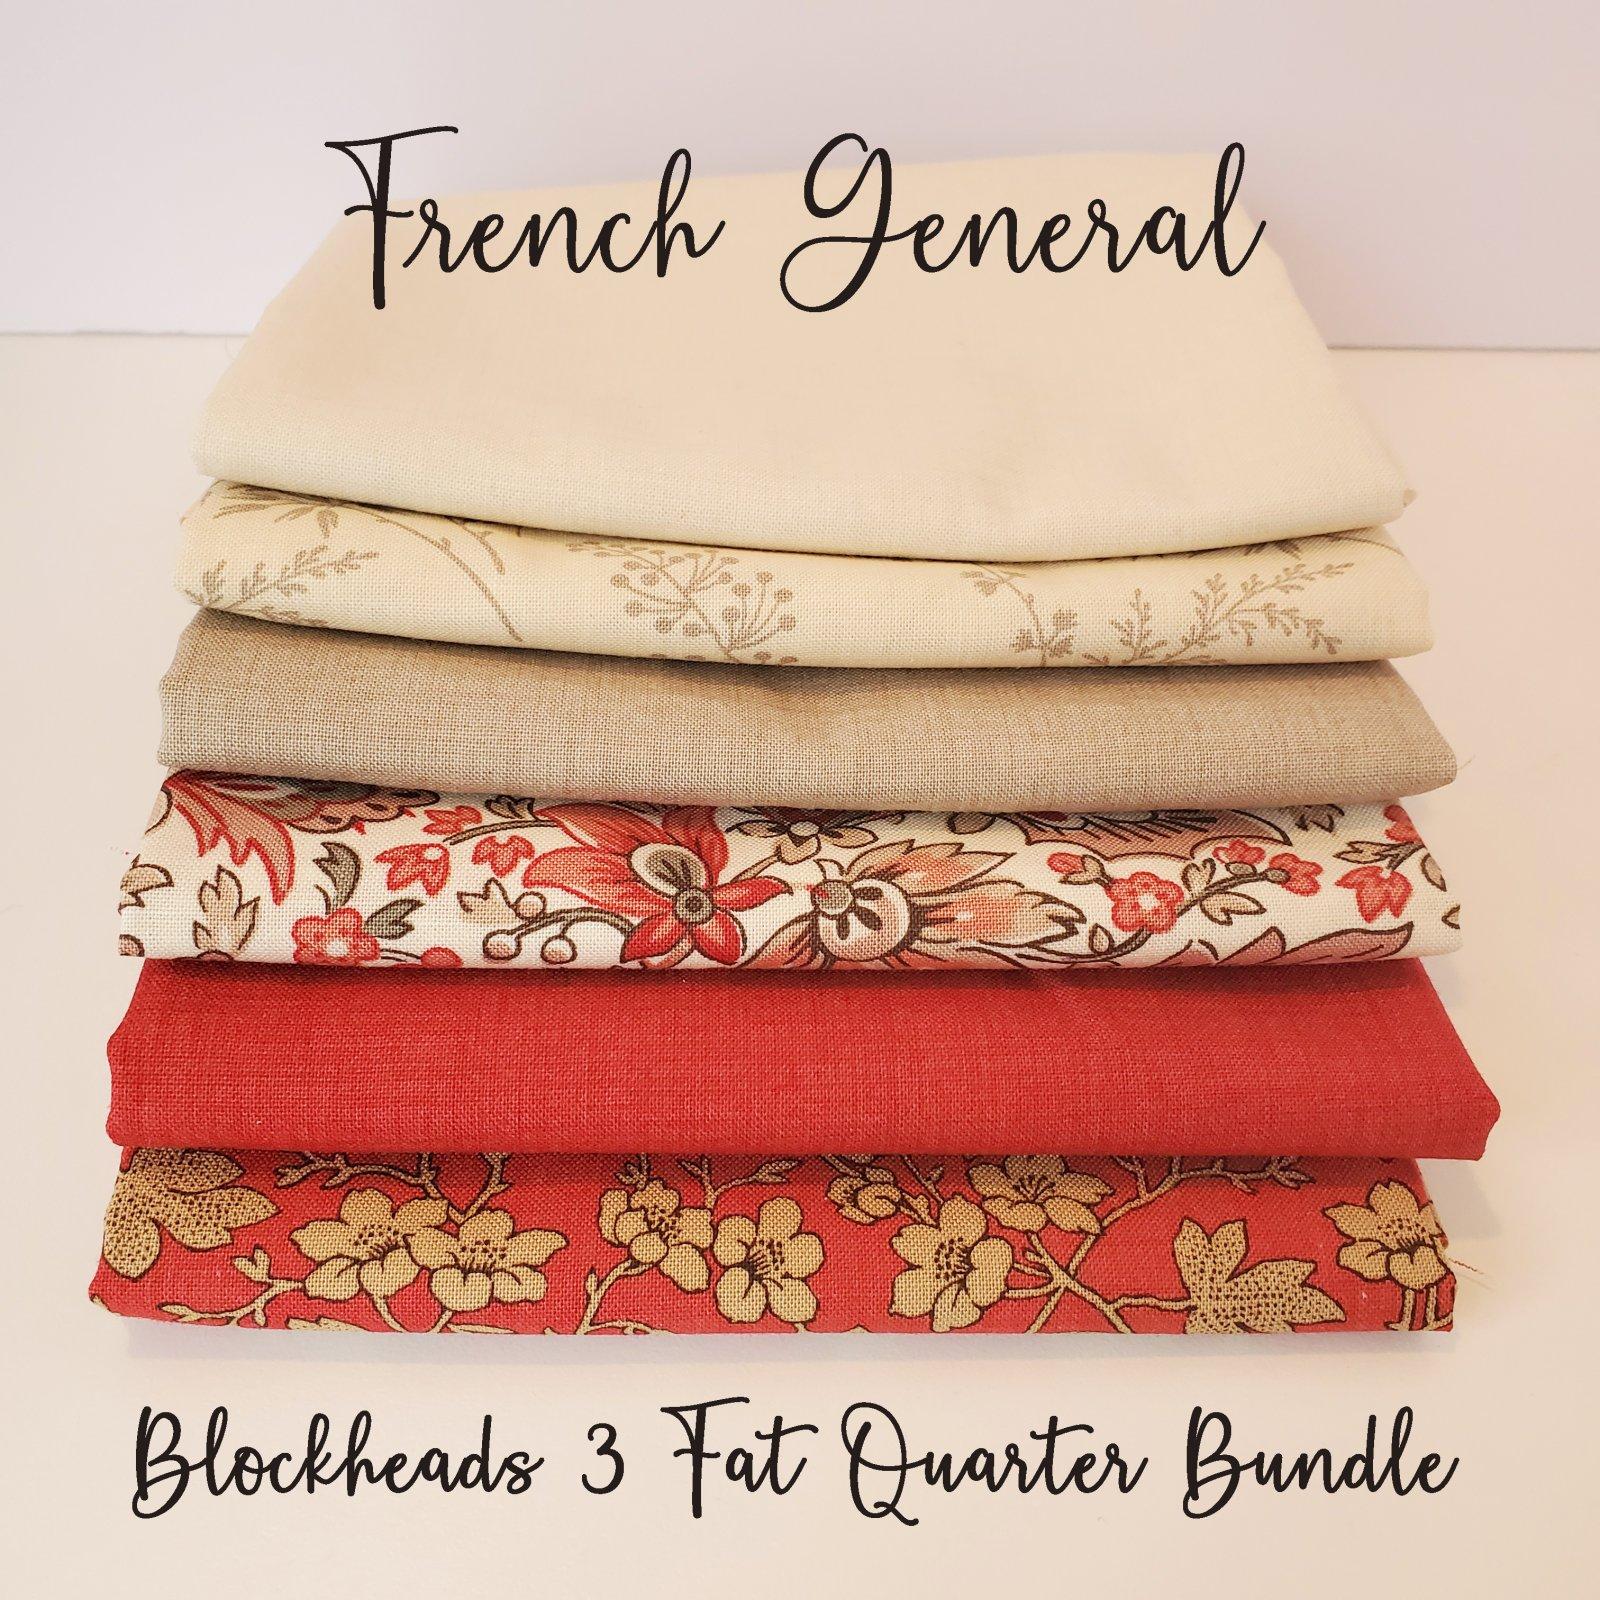 French General Blockheads 3 Fat Quarter Bundle